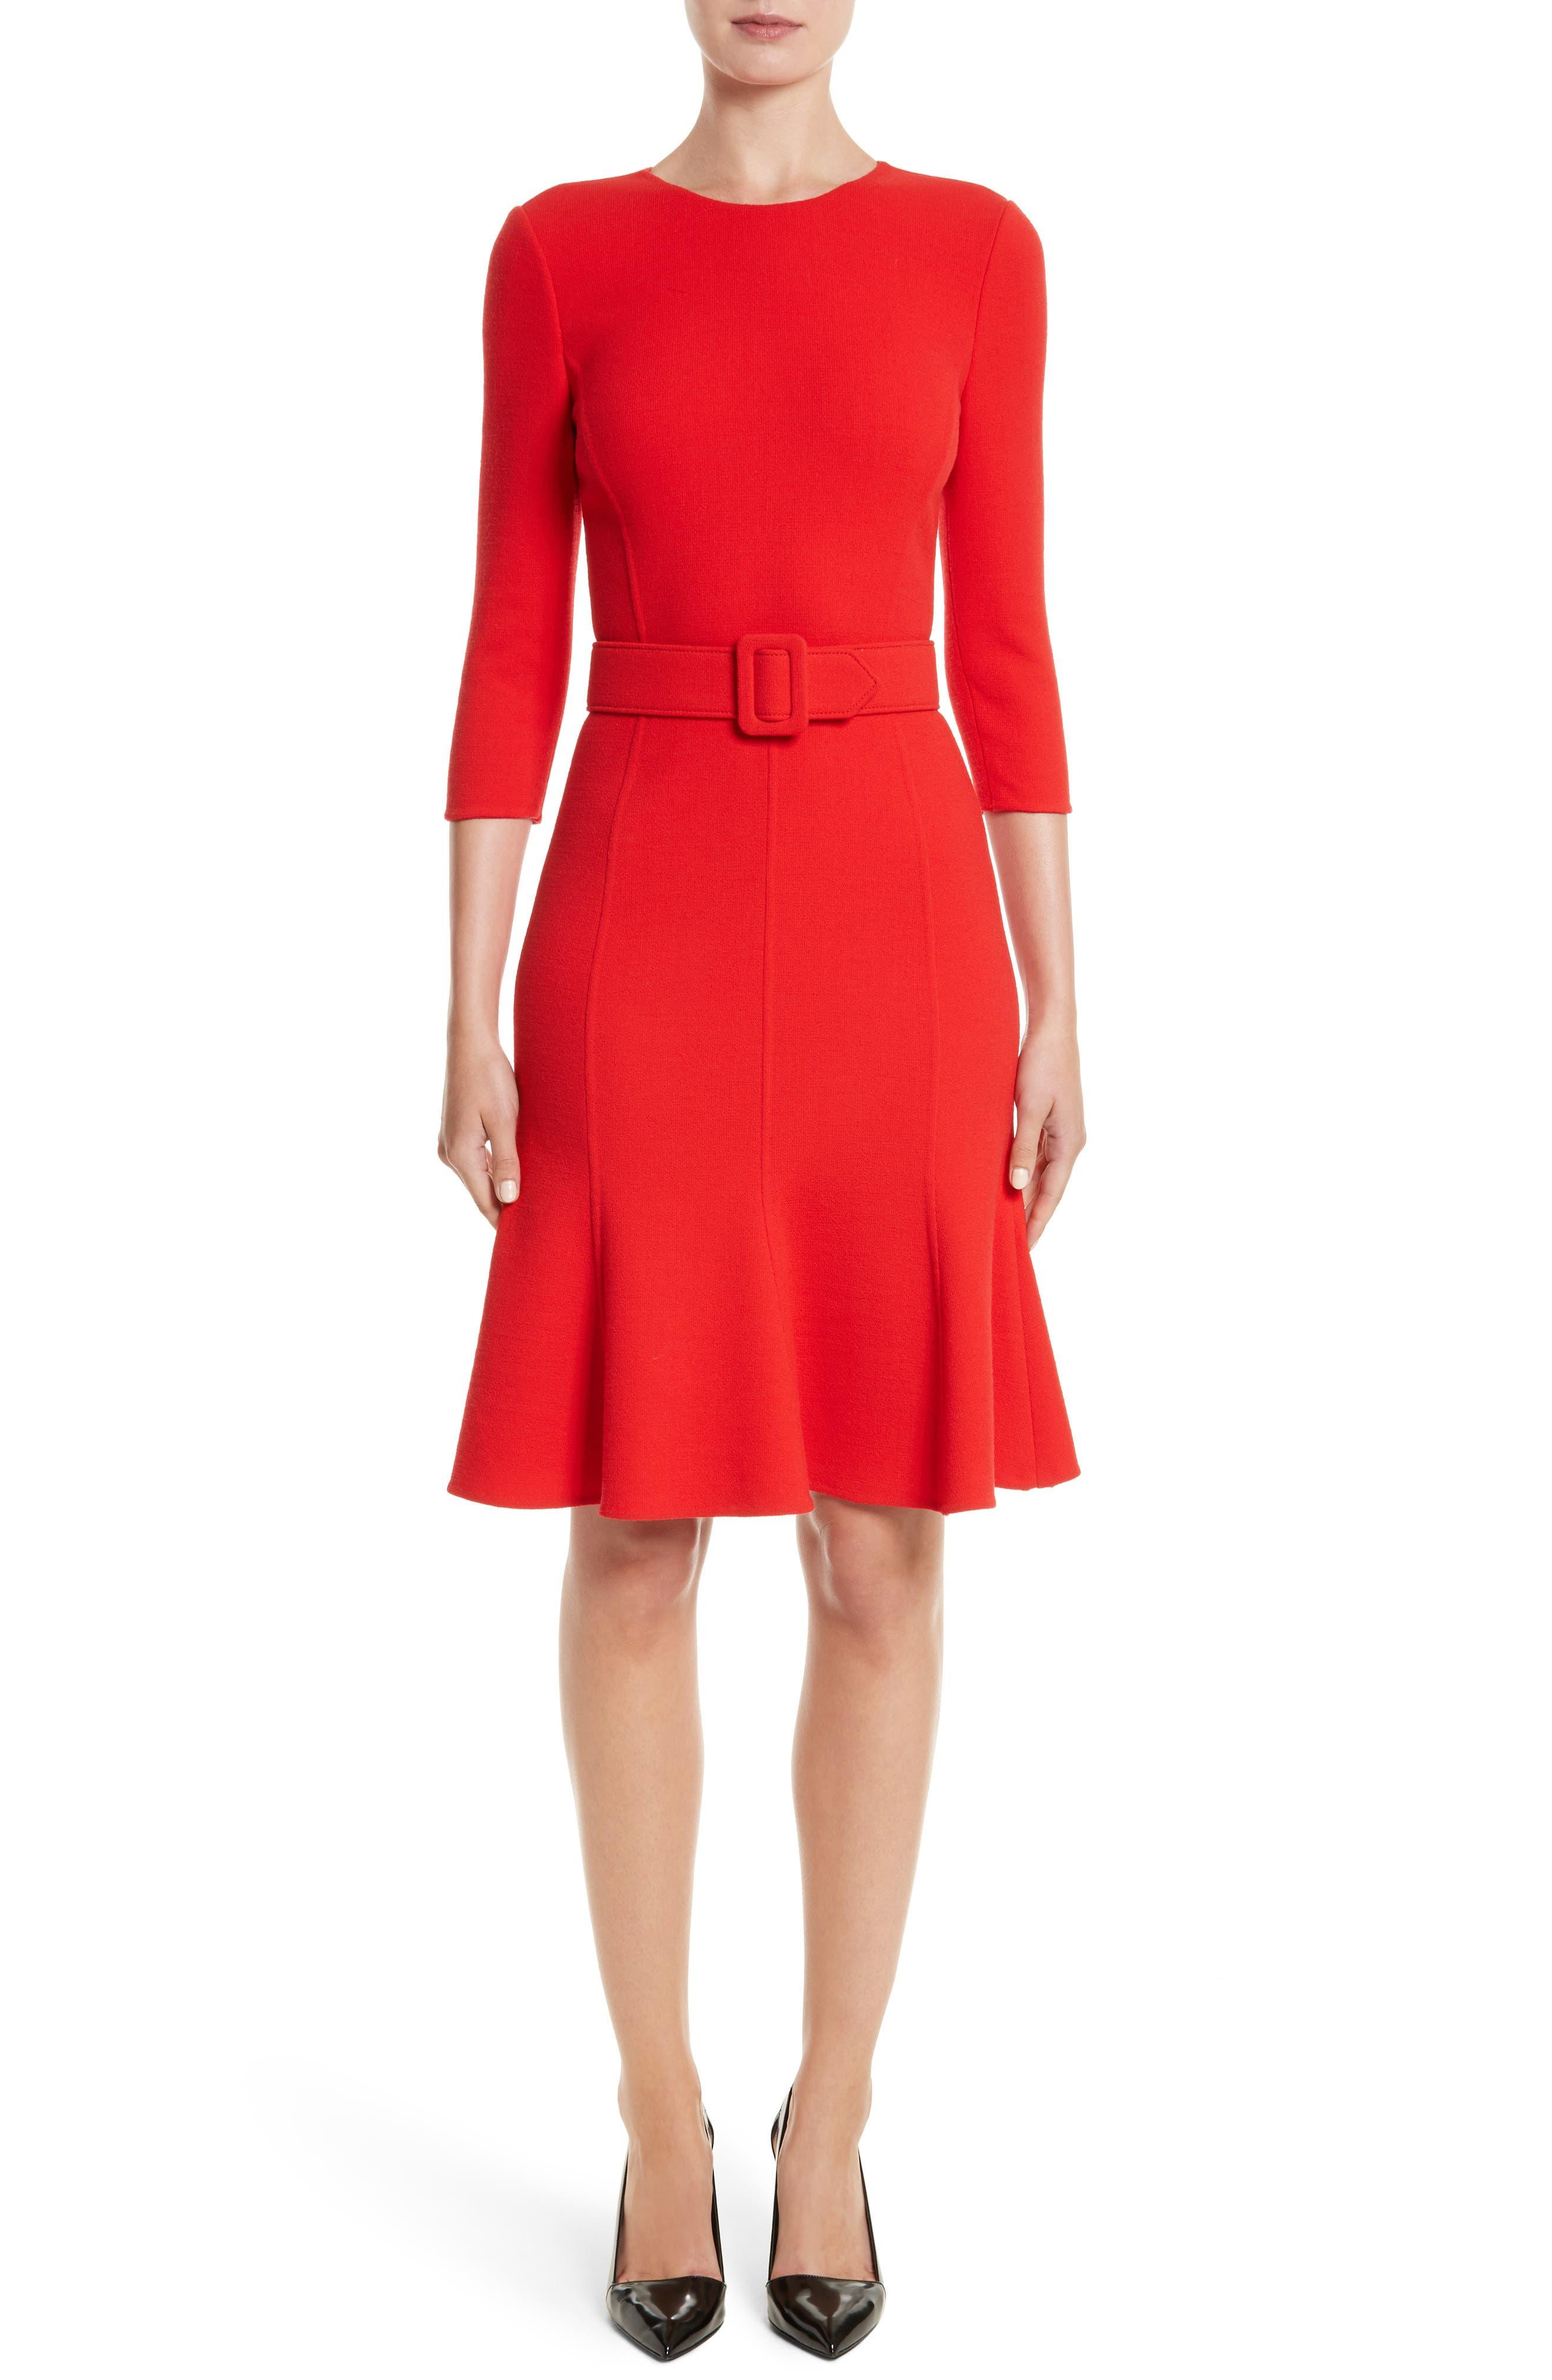 Main Image - Oscar de la Renta Crepe Fit & Flare Dress